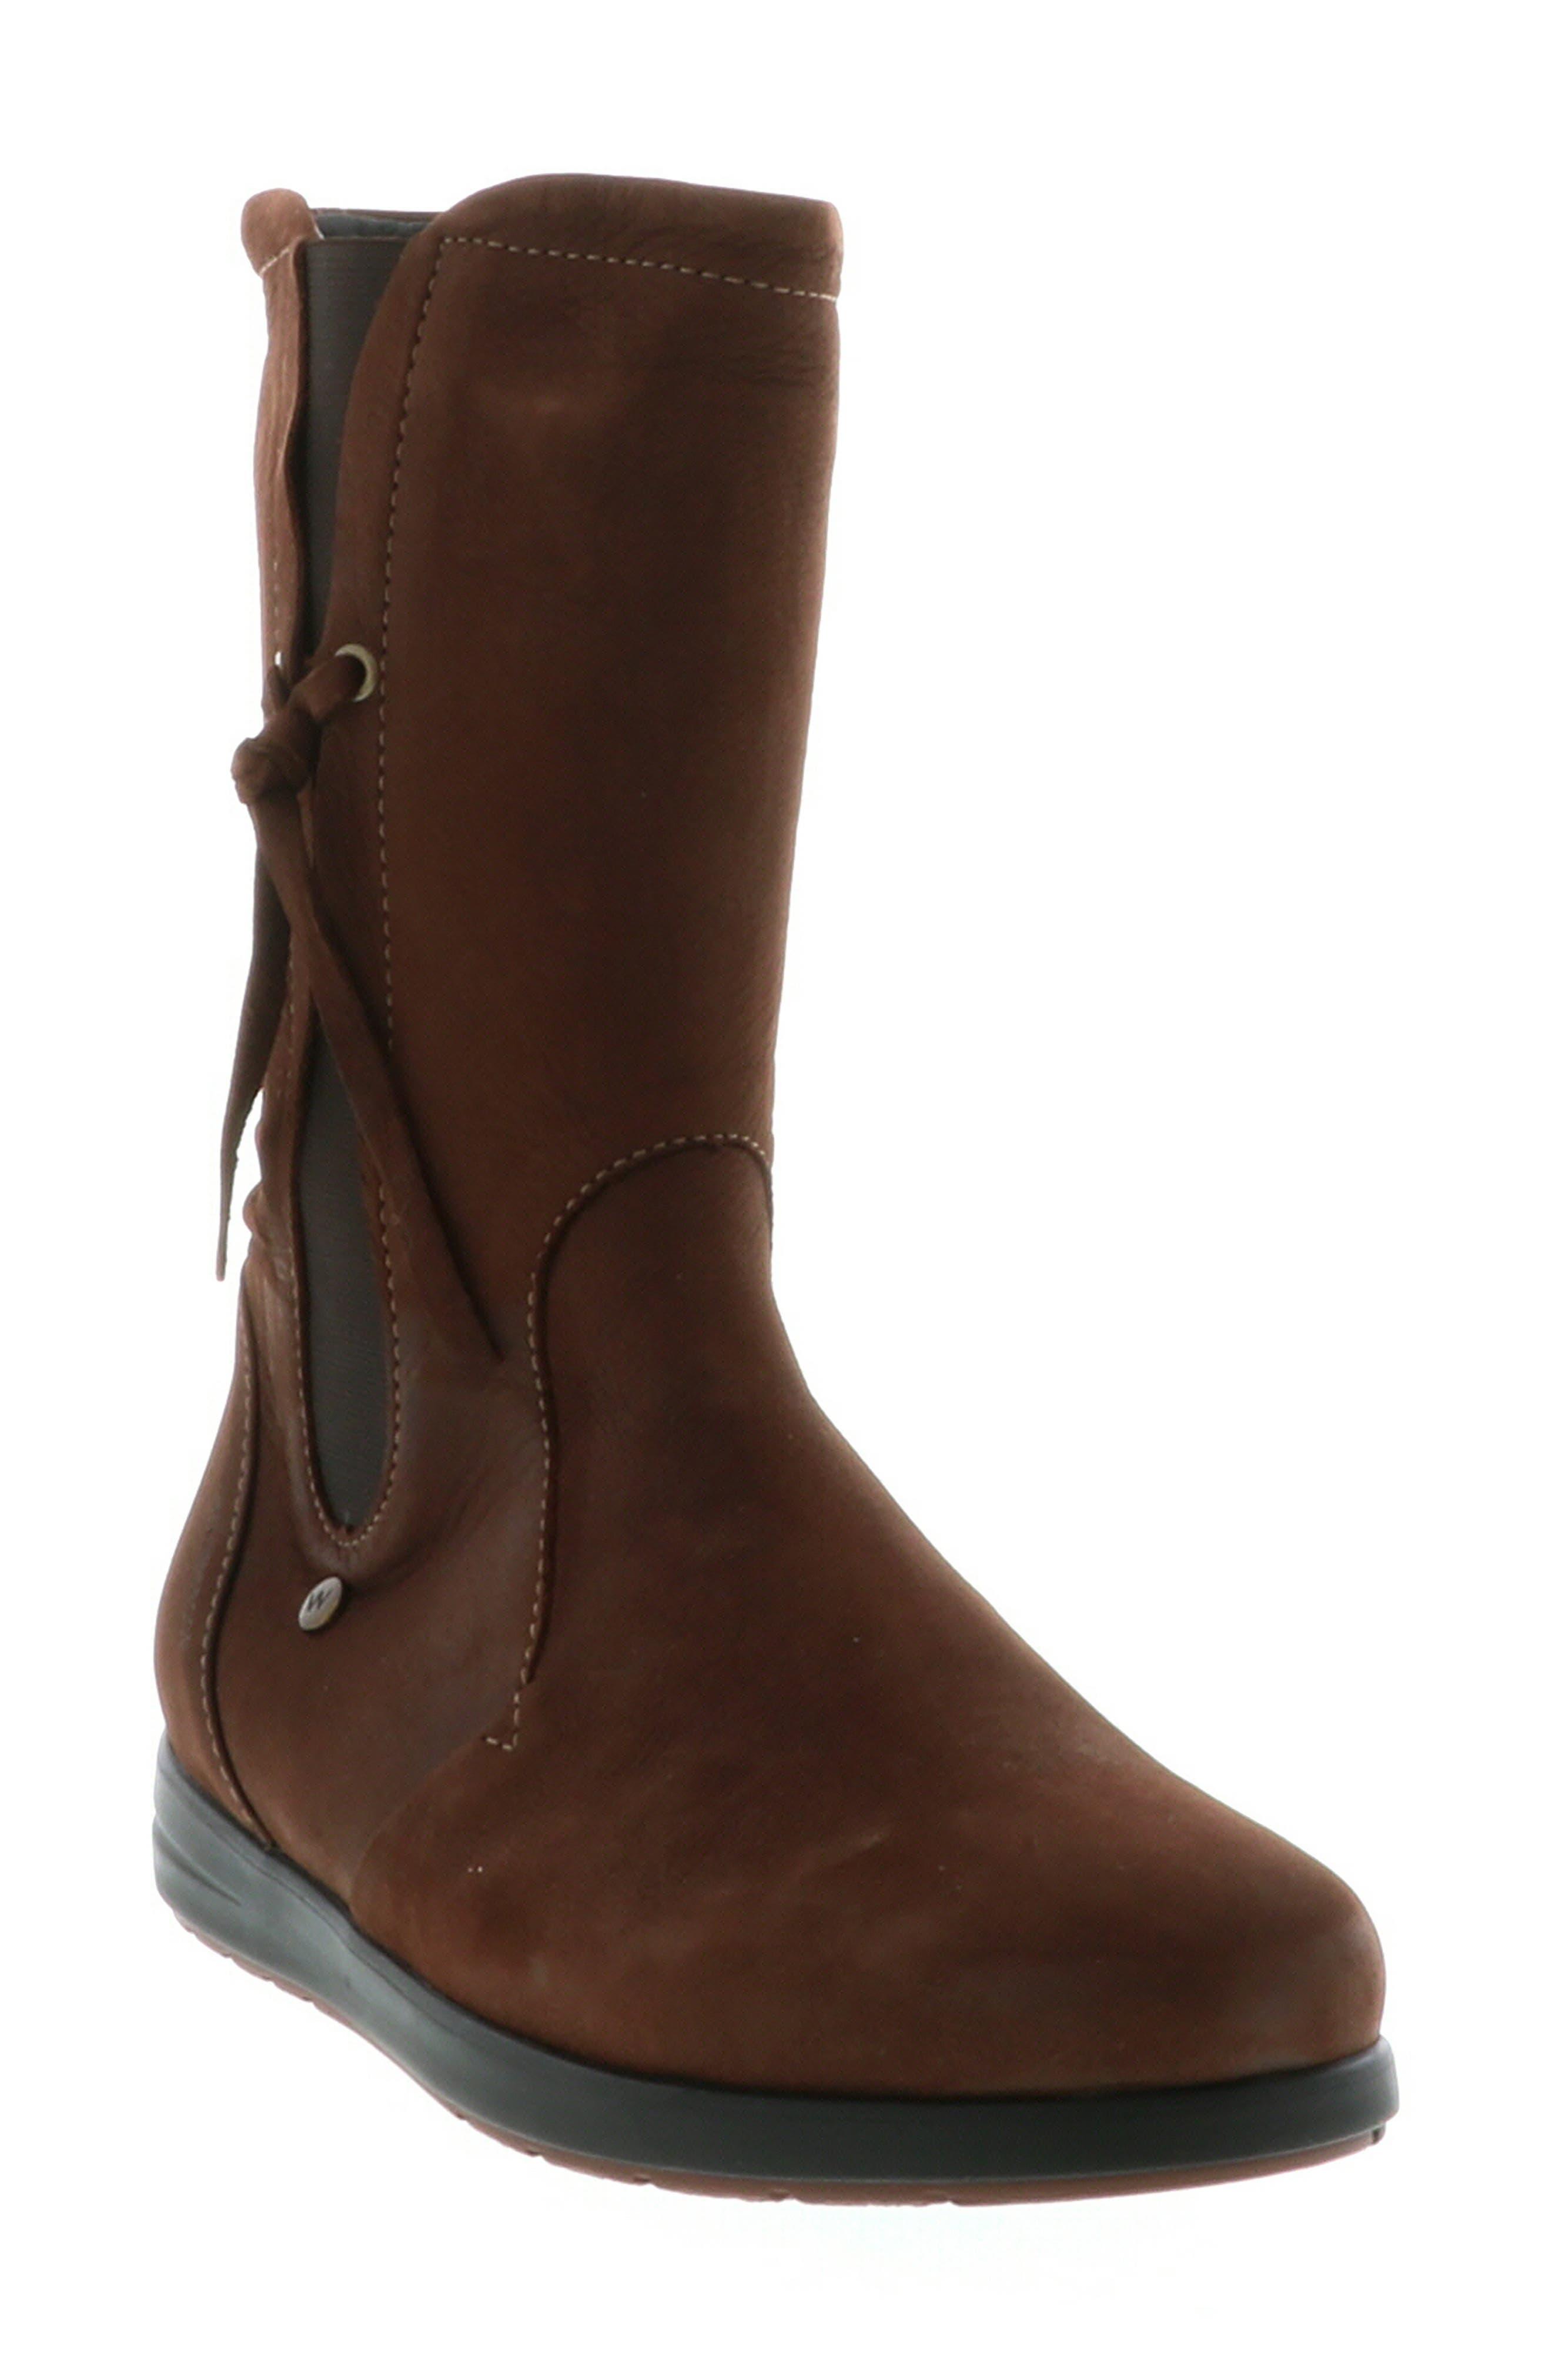 Wolky Newton Waterproof Boot - Brown